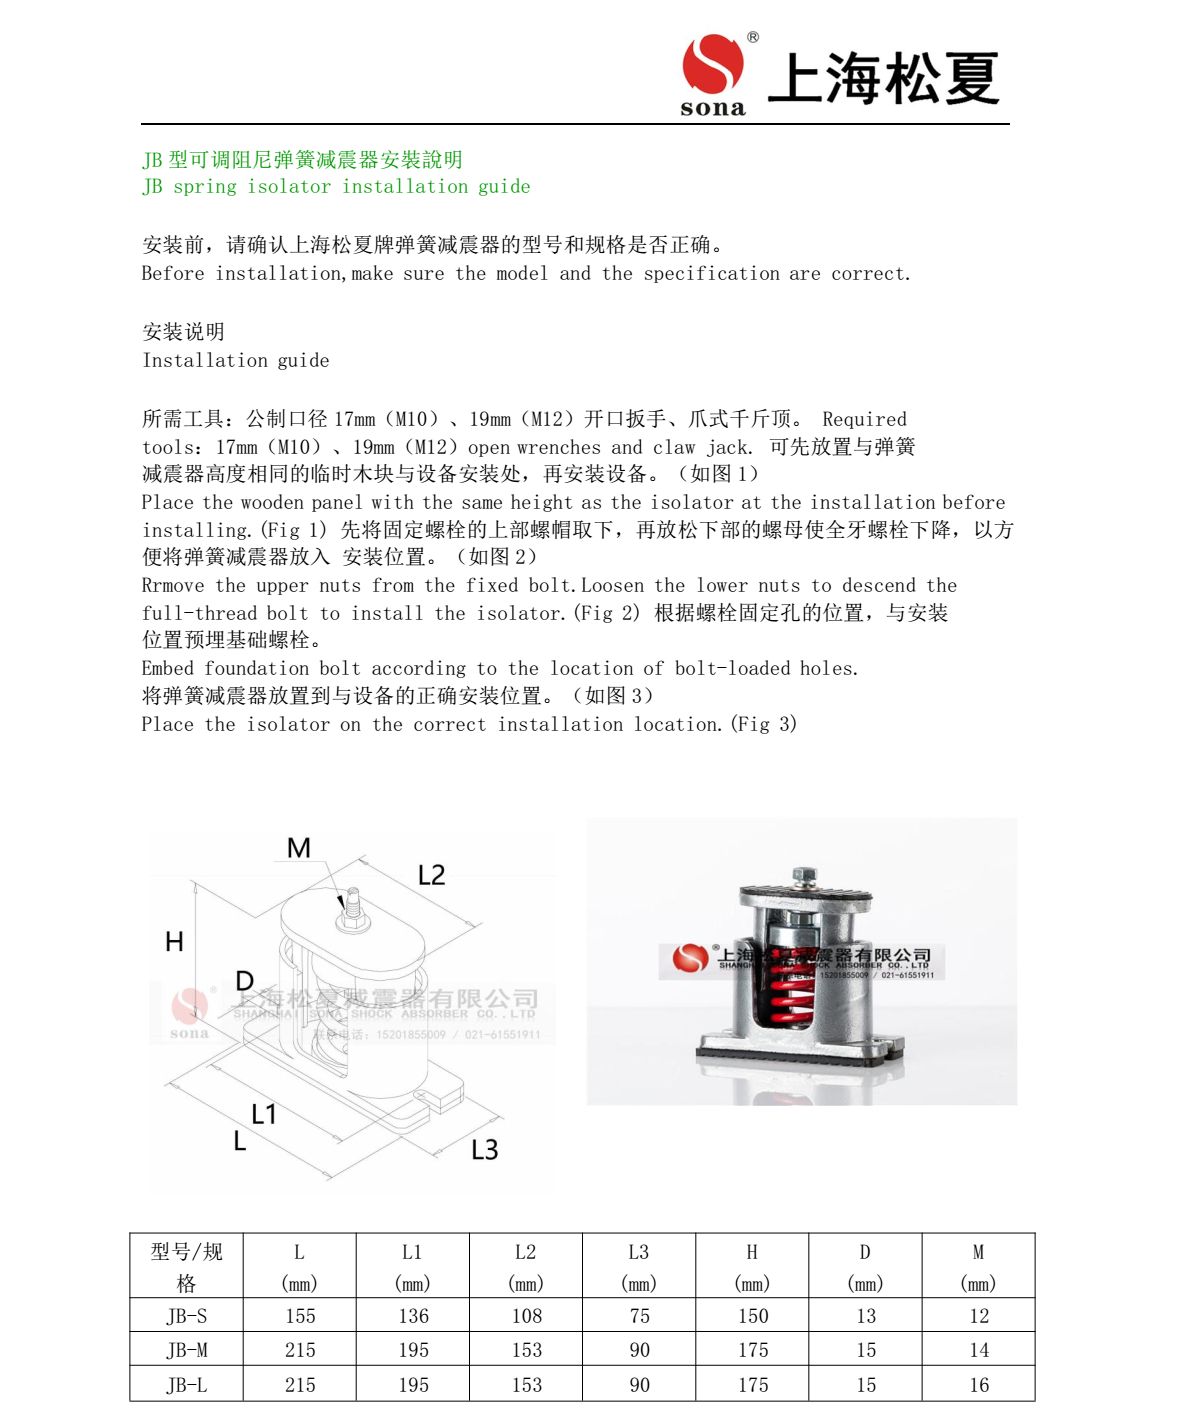 JB 型吊式弹簧减震器安装说明